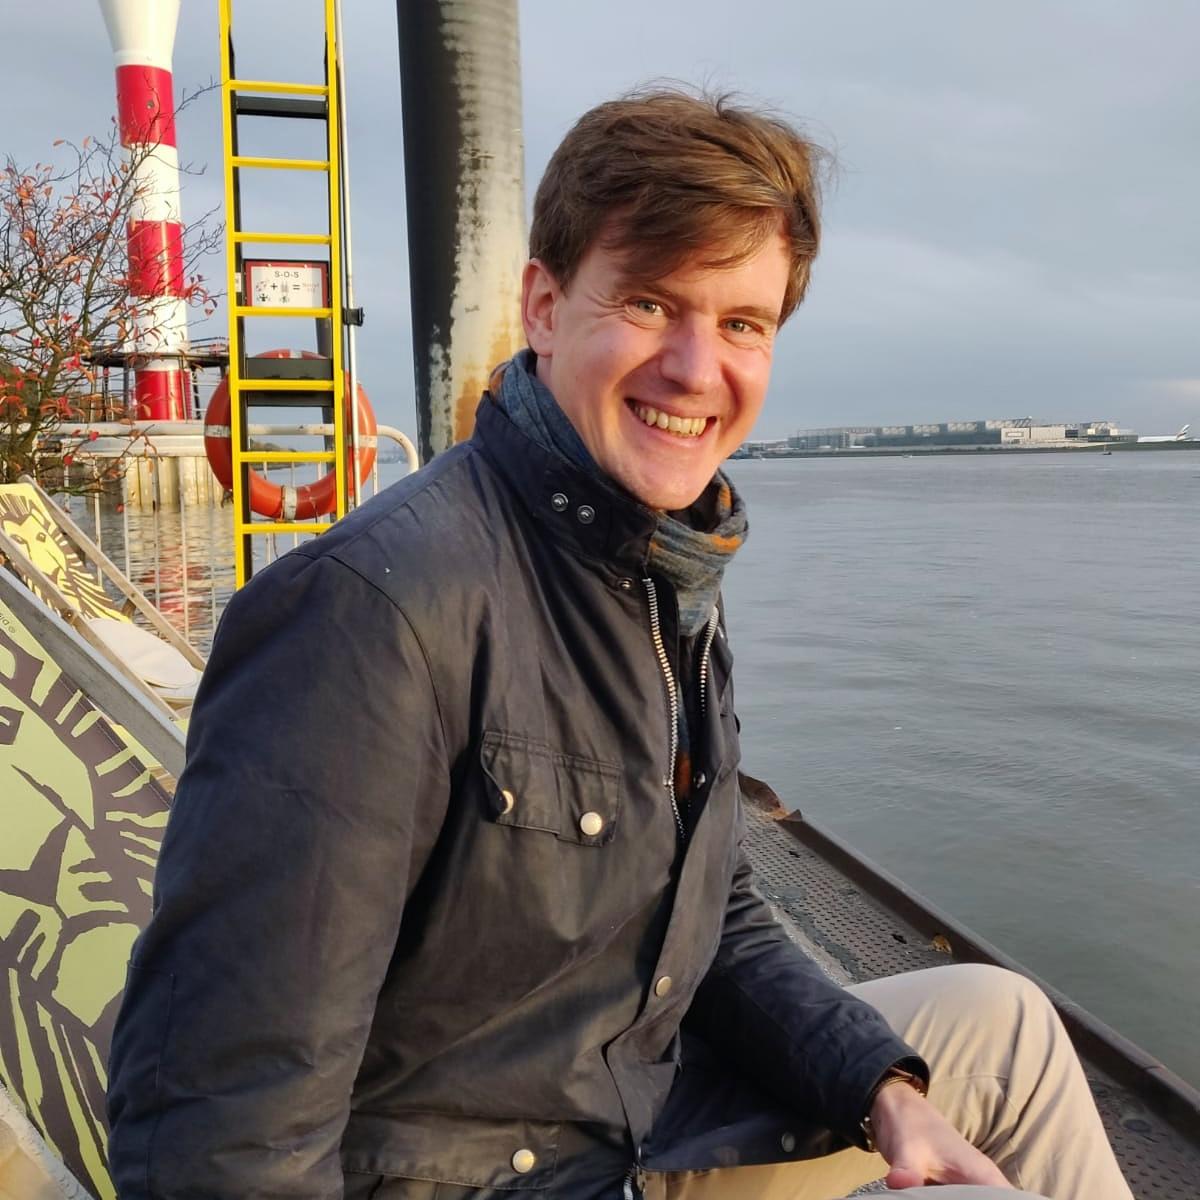 Renaud van Strydonck, Game Designer